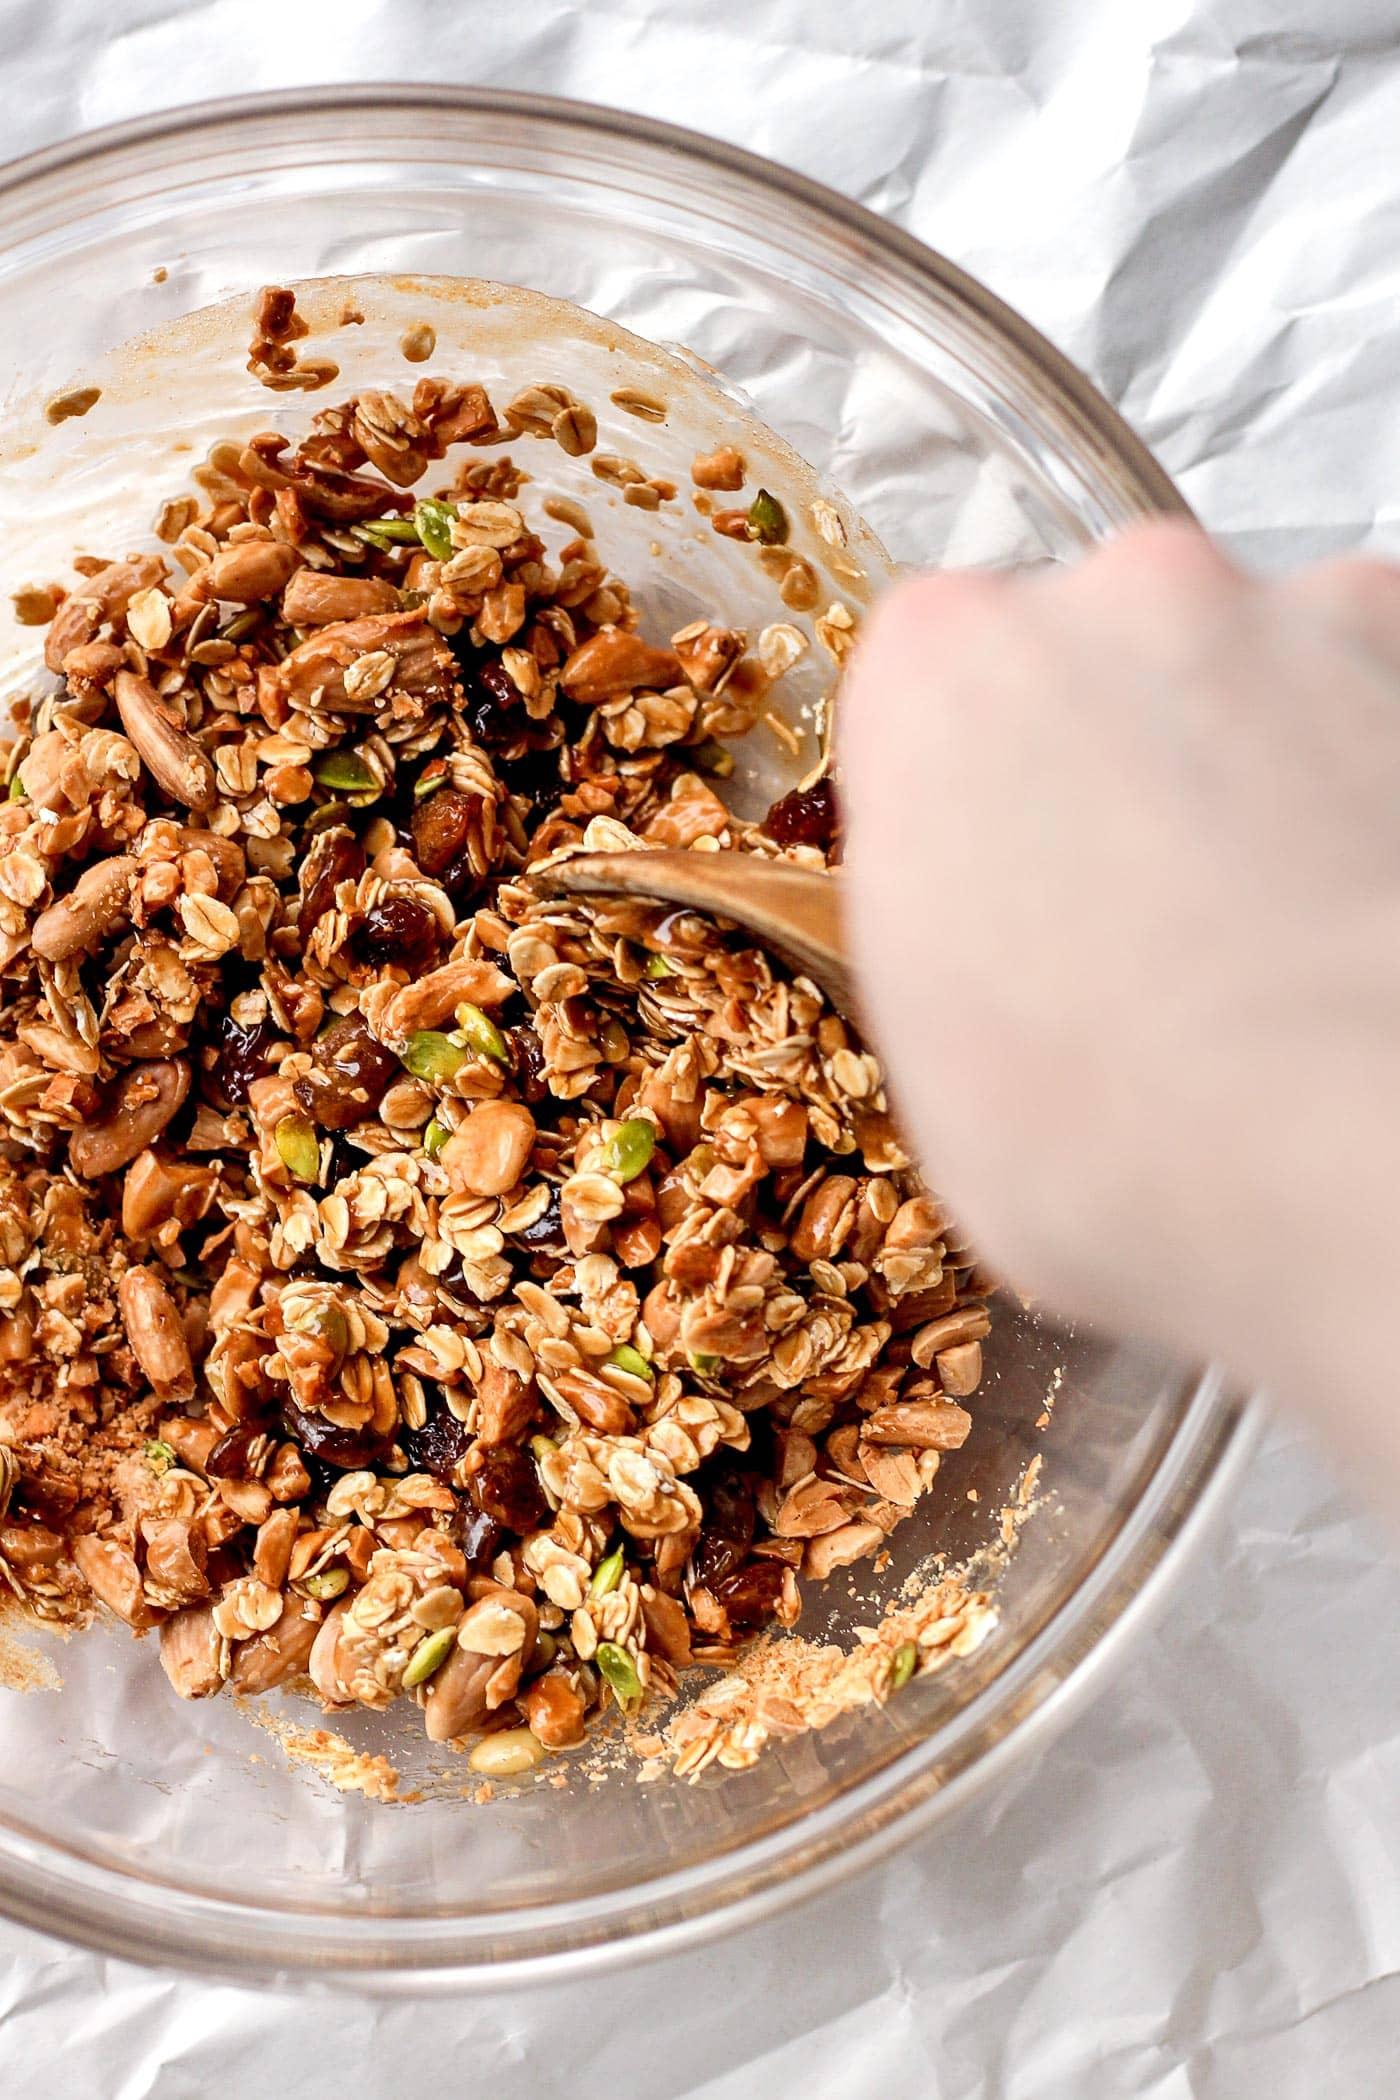 Raisin and Almond Snack Squares